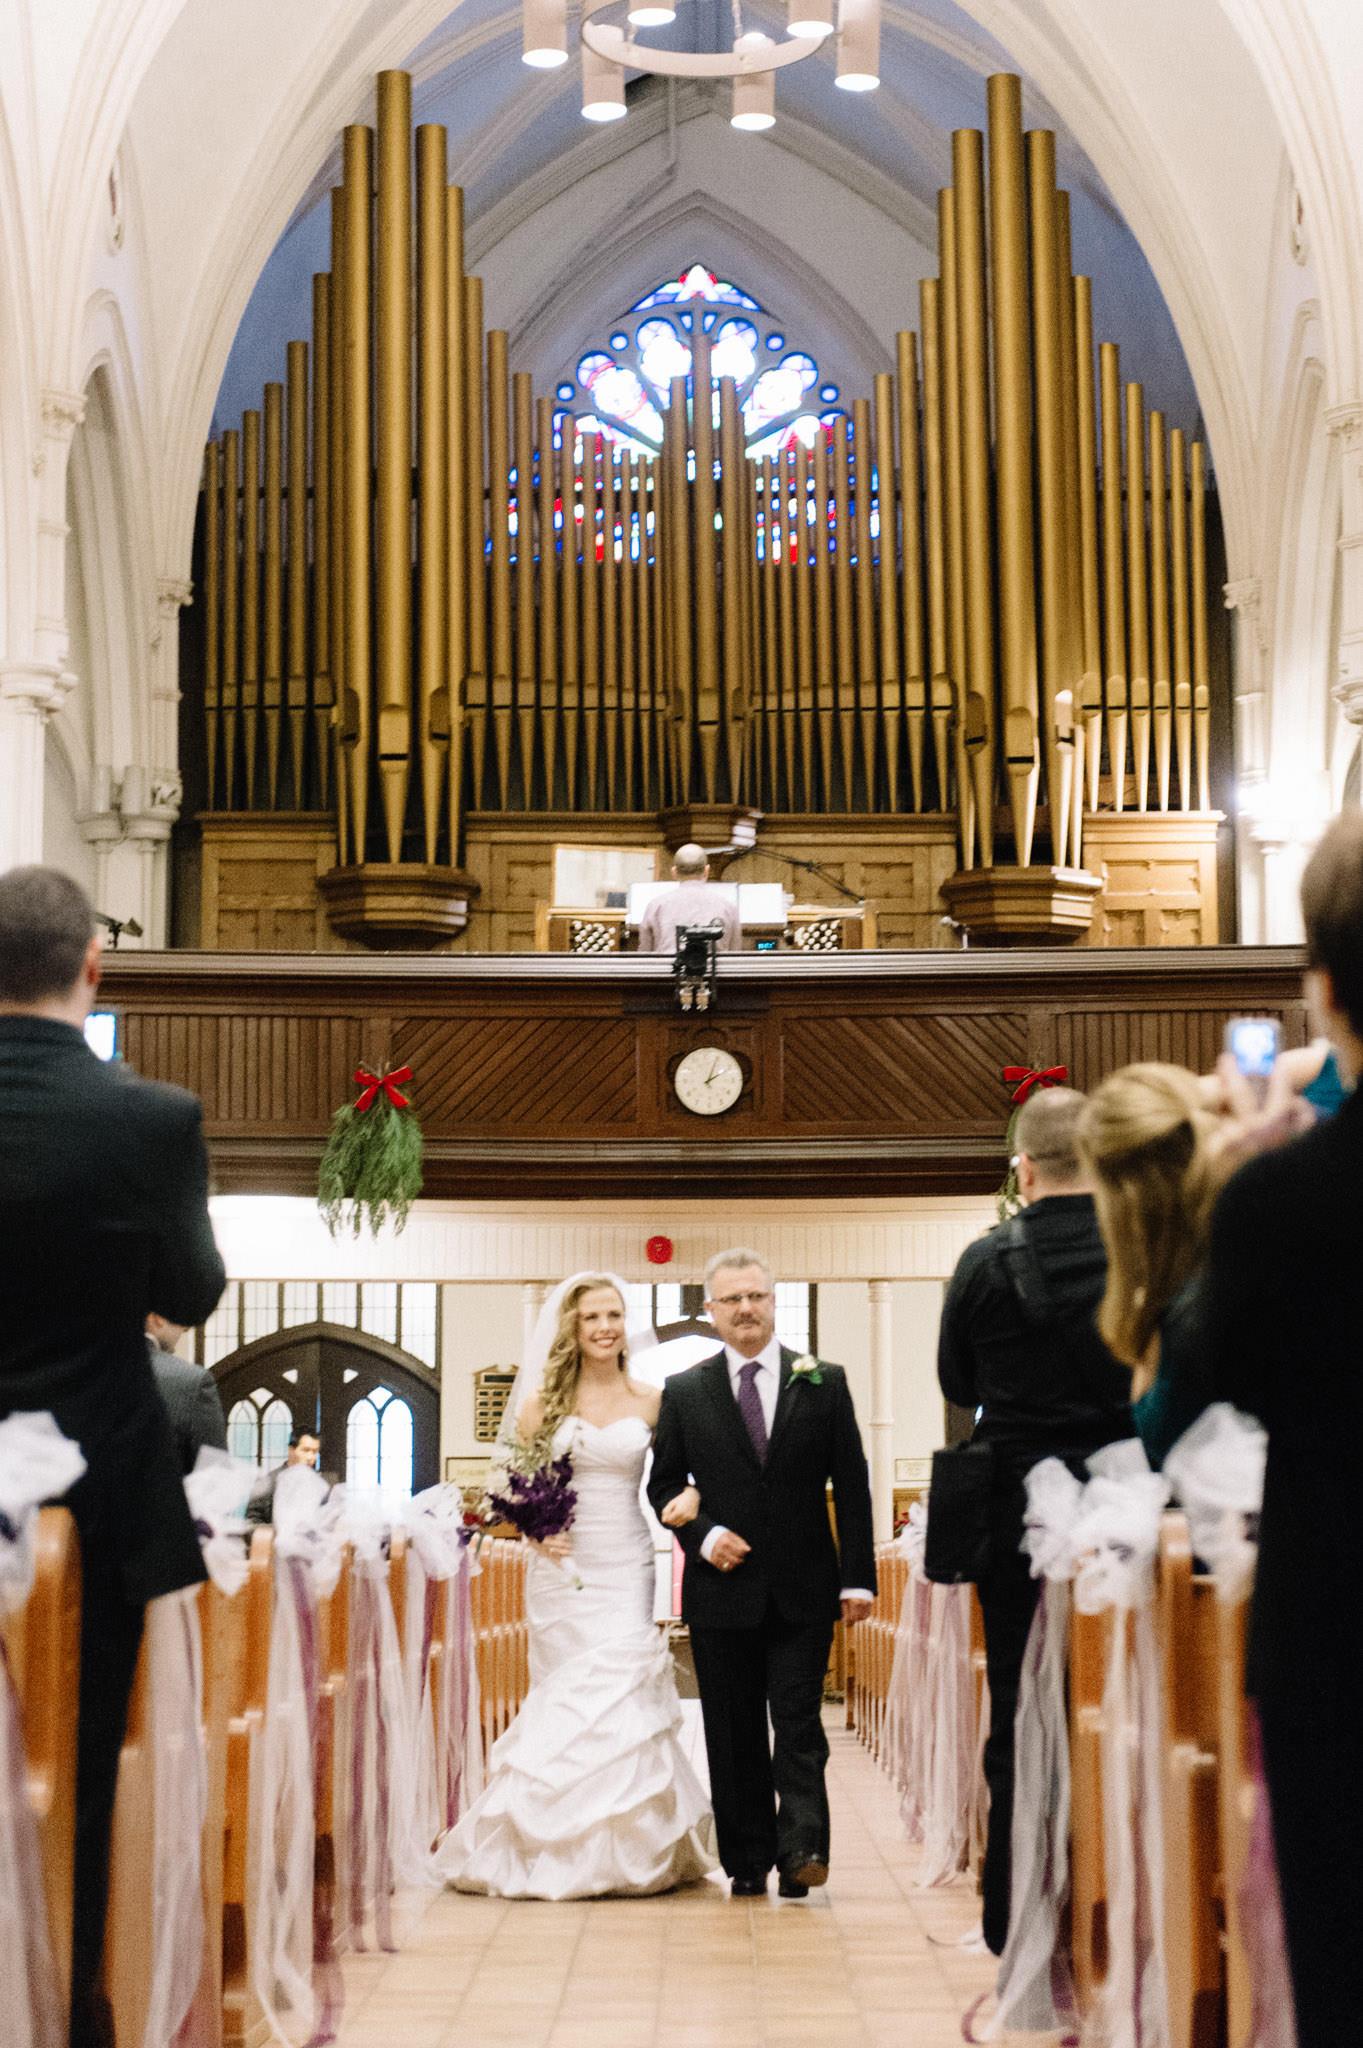 St Basil's Church Toronto wedding